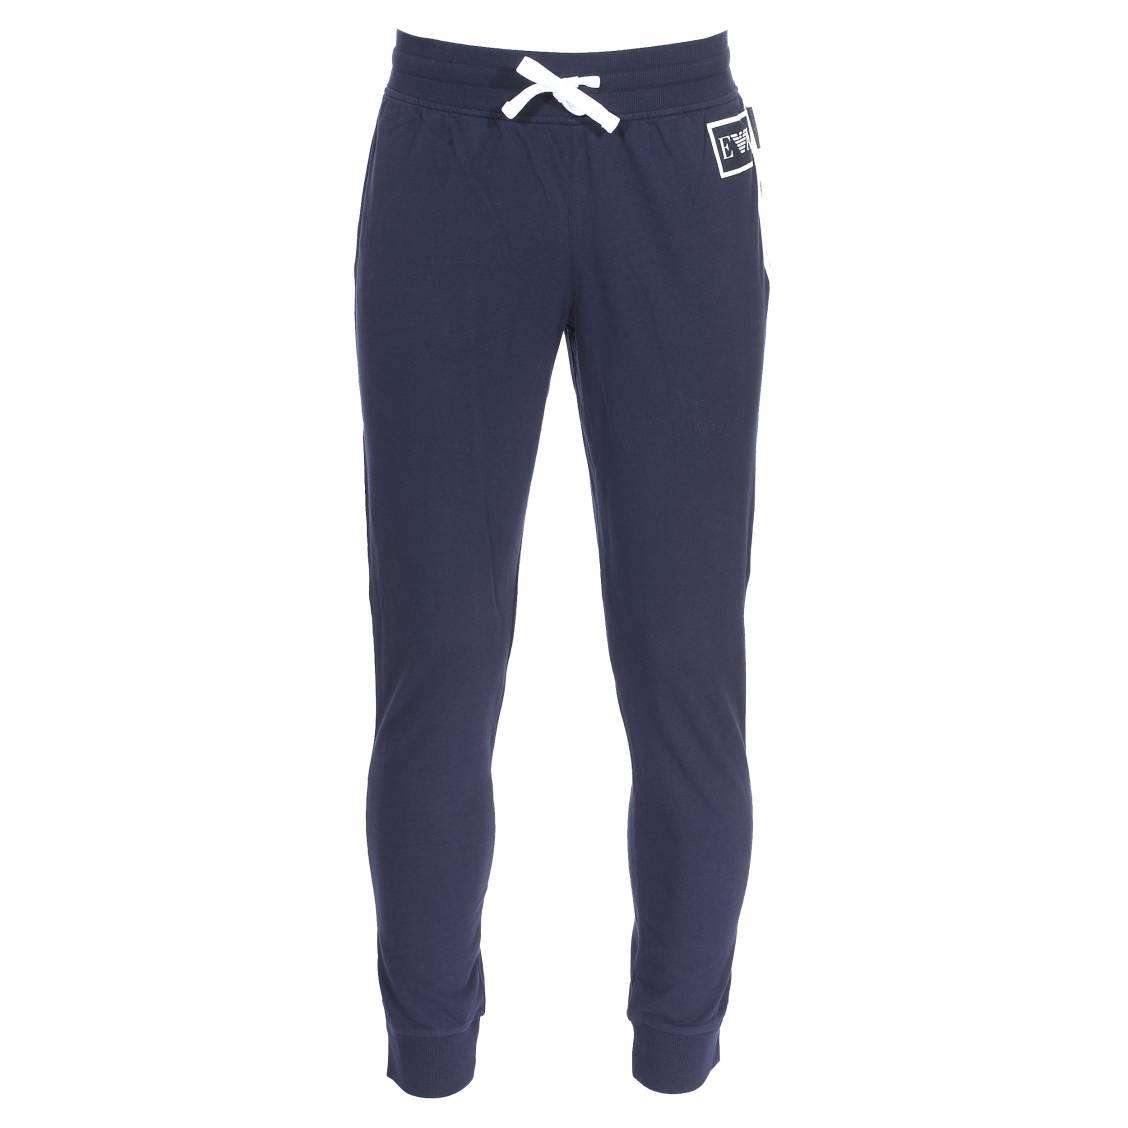 Pantalon d'intérieur forme jogging Emporio Armani bleu marine